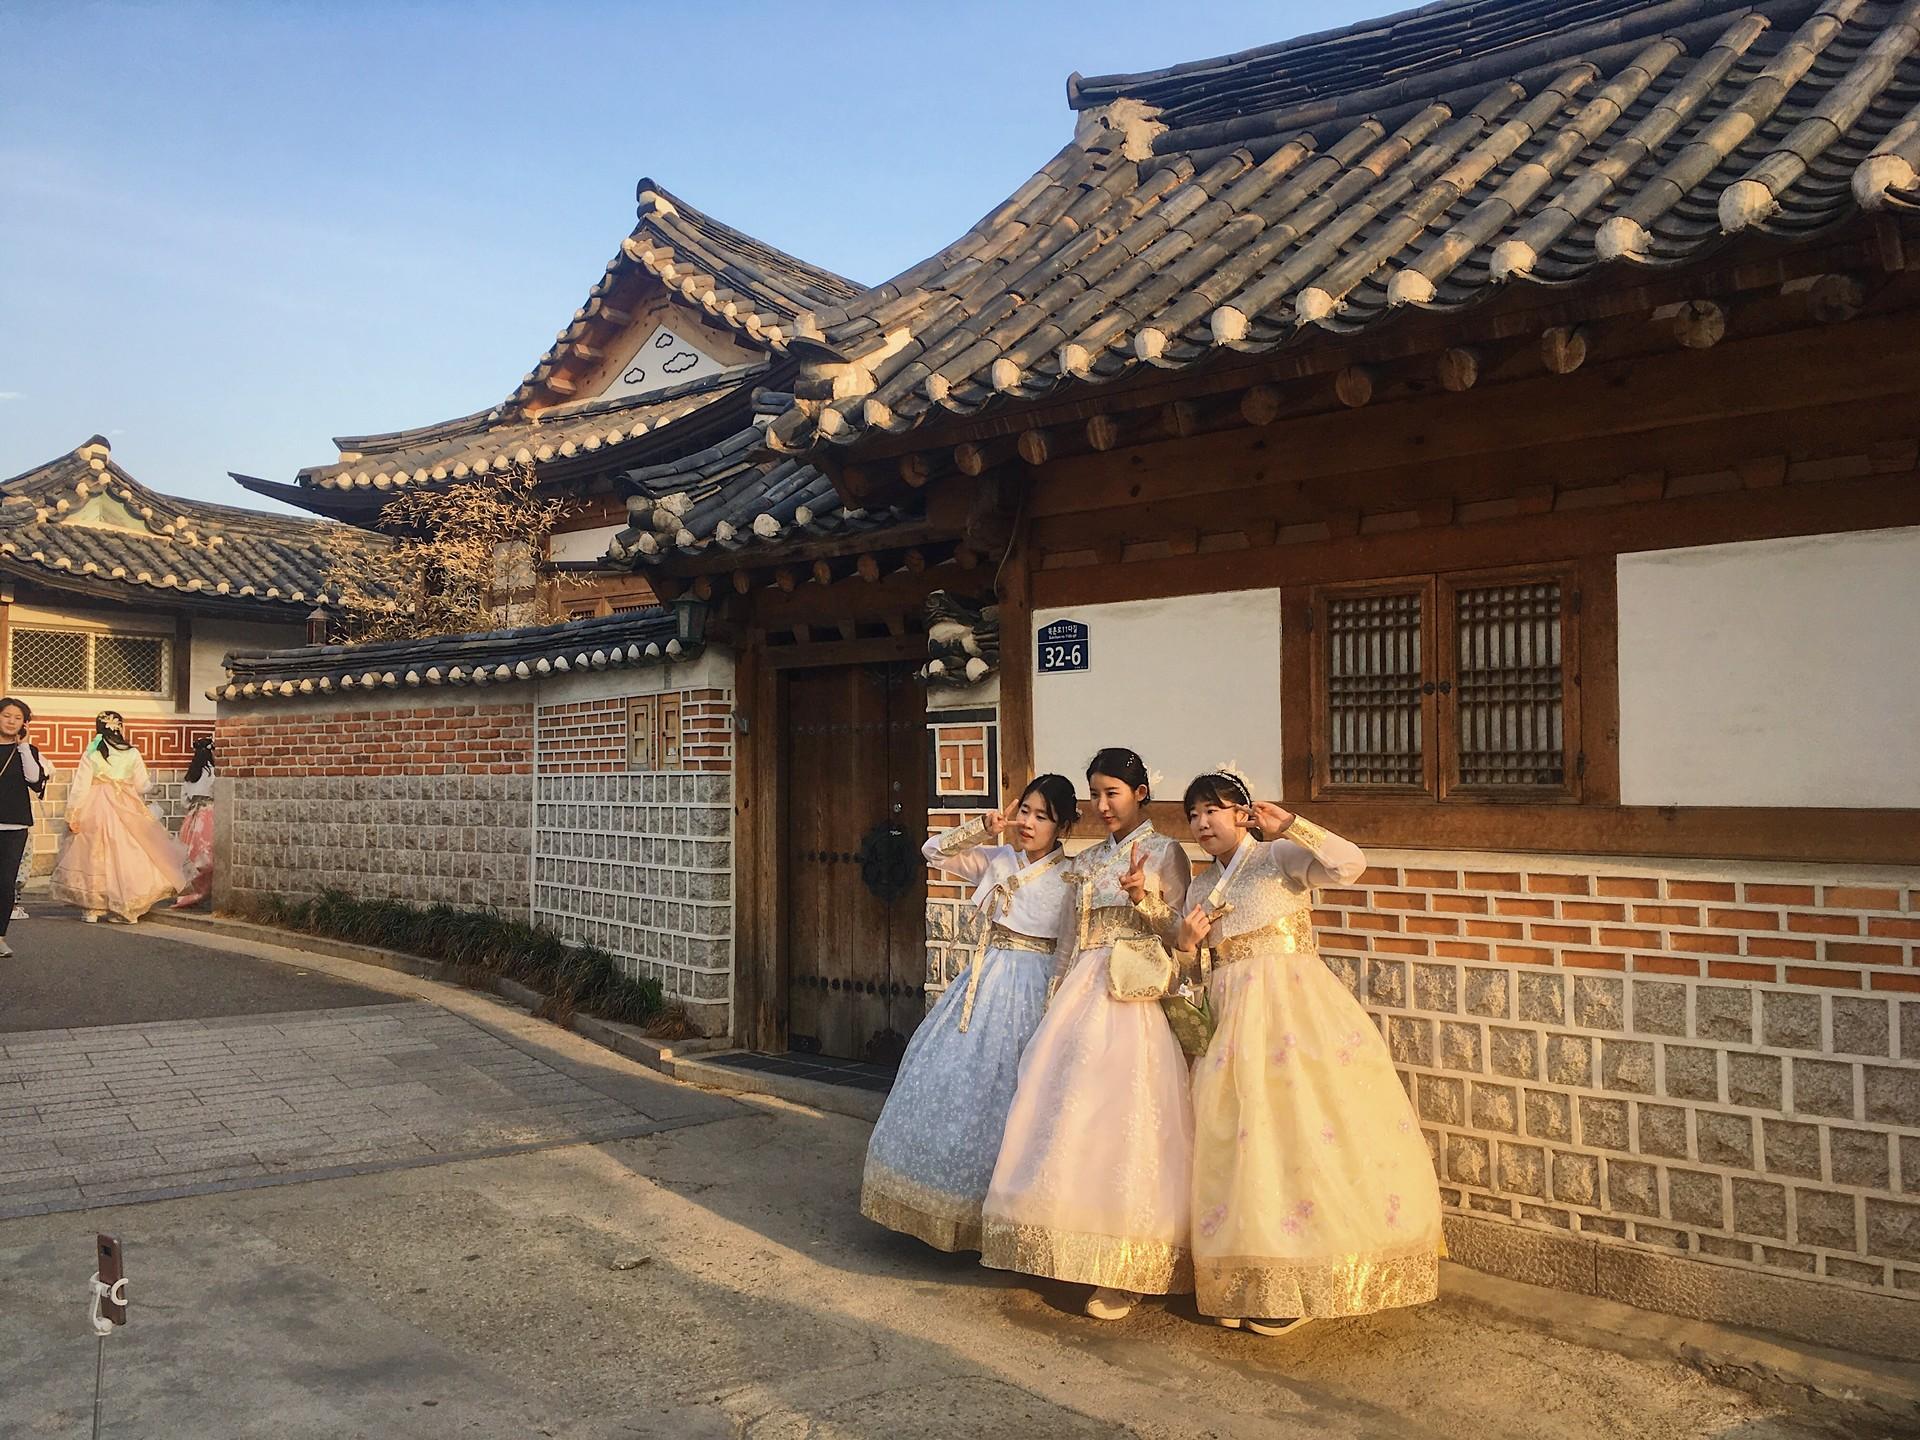 seoul-south-korea-dd7d83863fbba6f2ff5b74